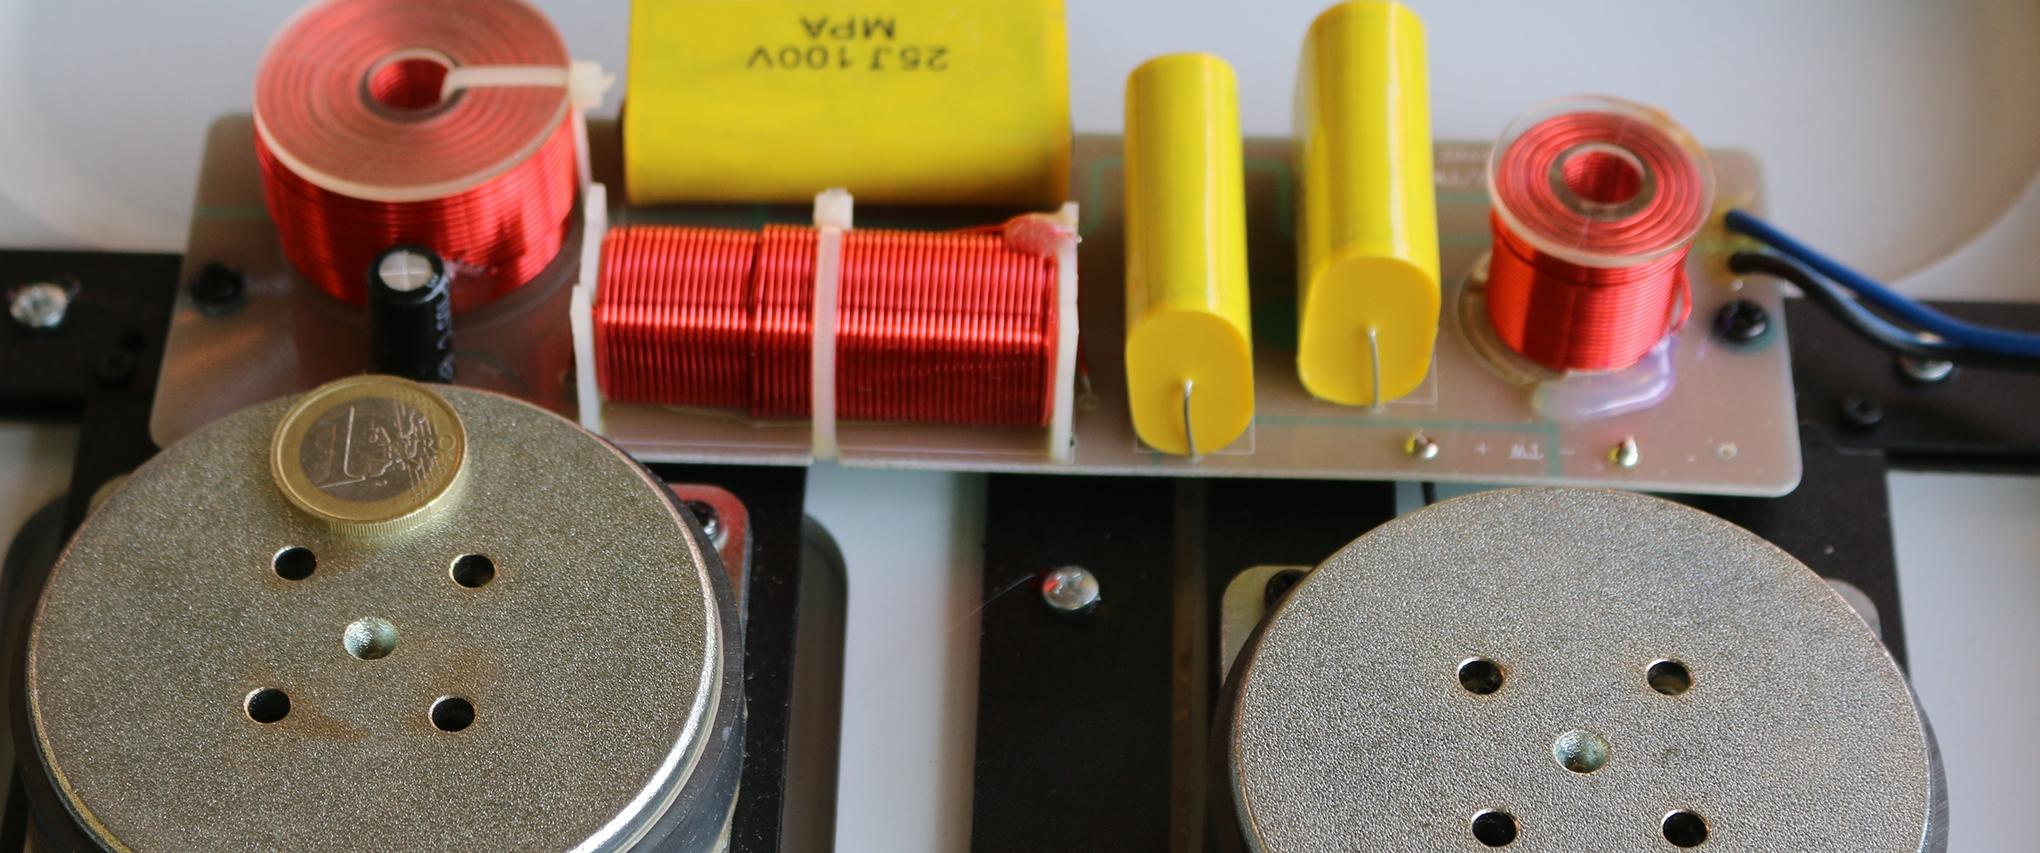 unsichtbare Lautsprecher - 2- oder 3-Wege Technik